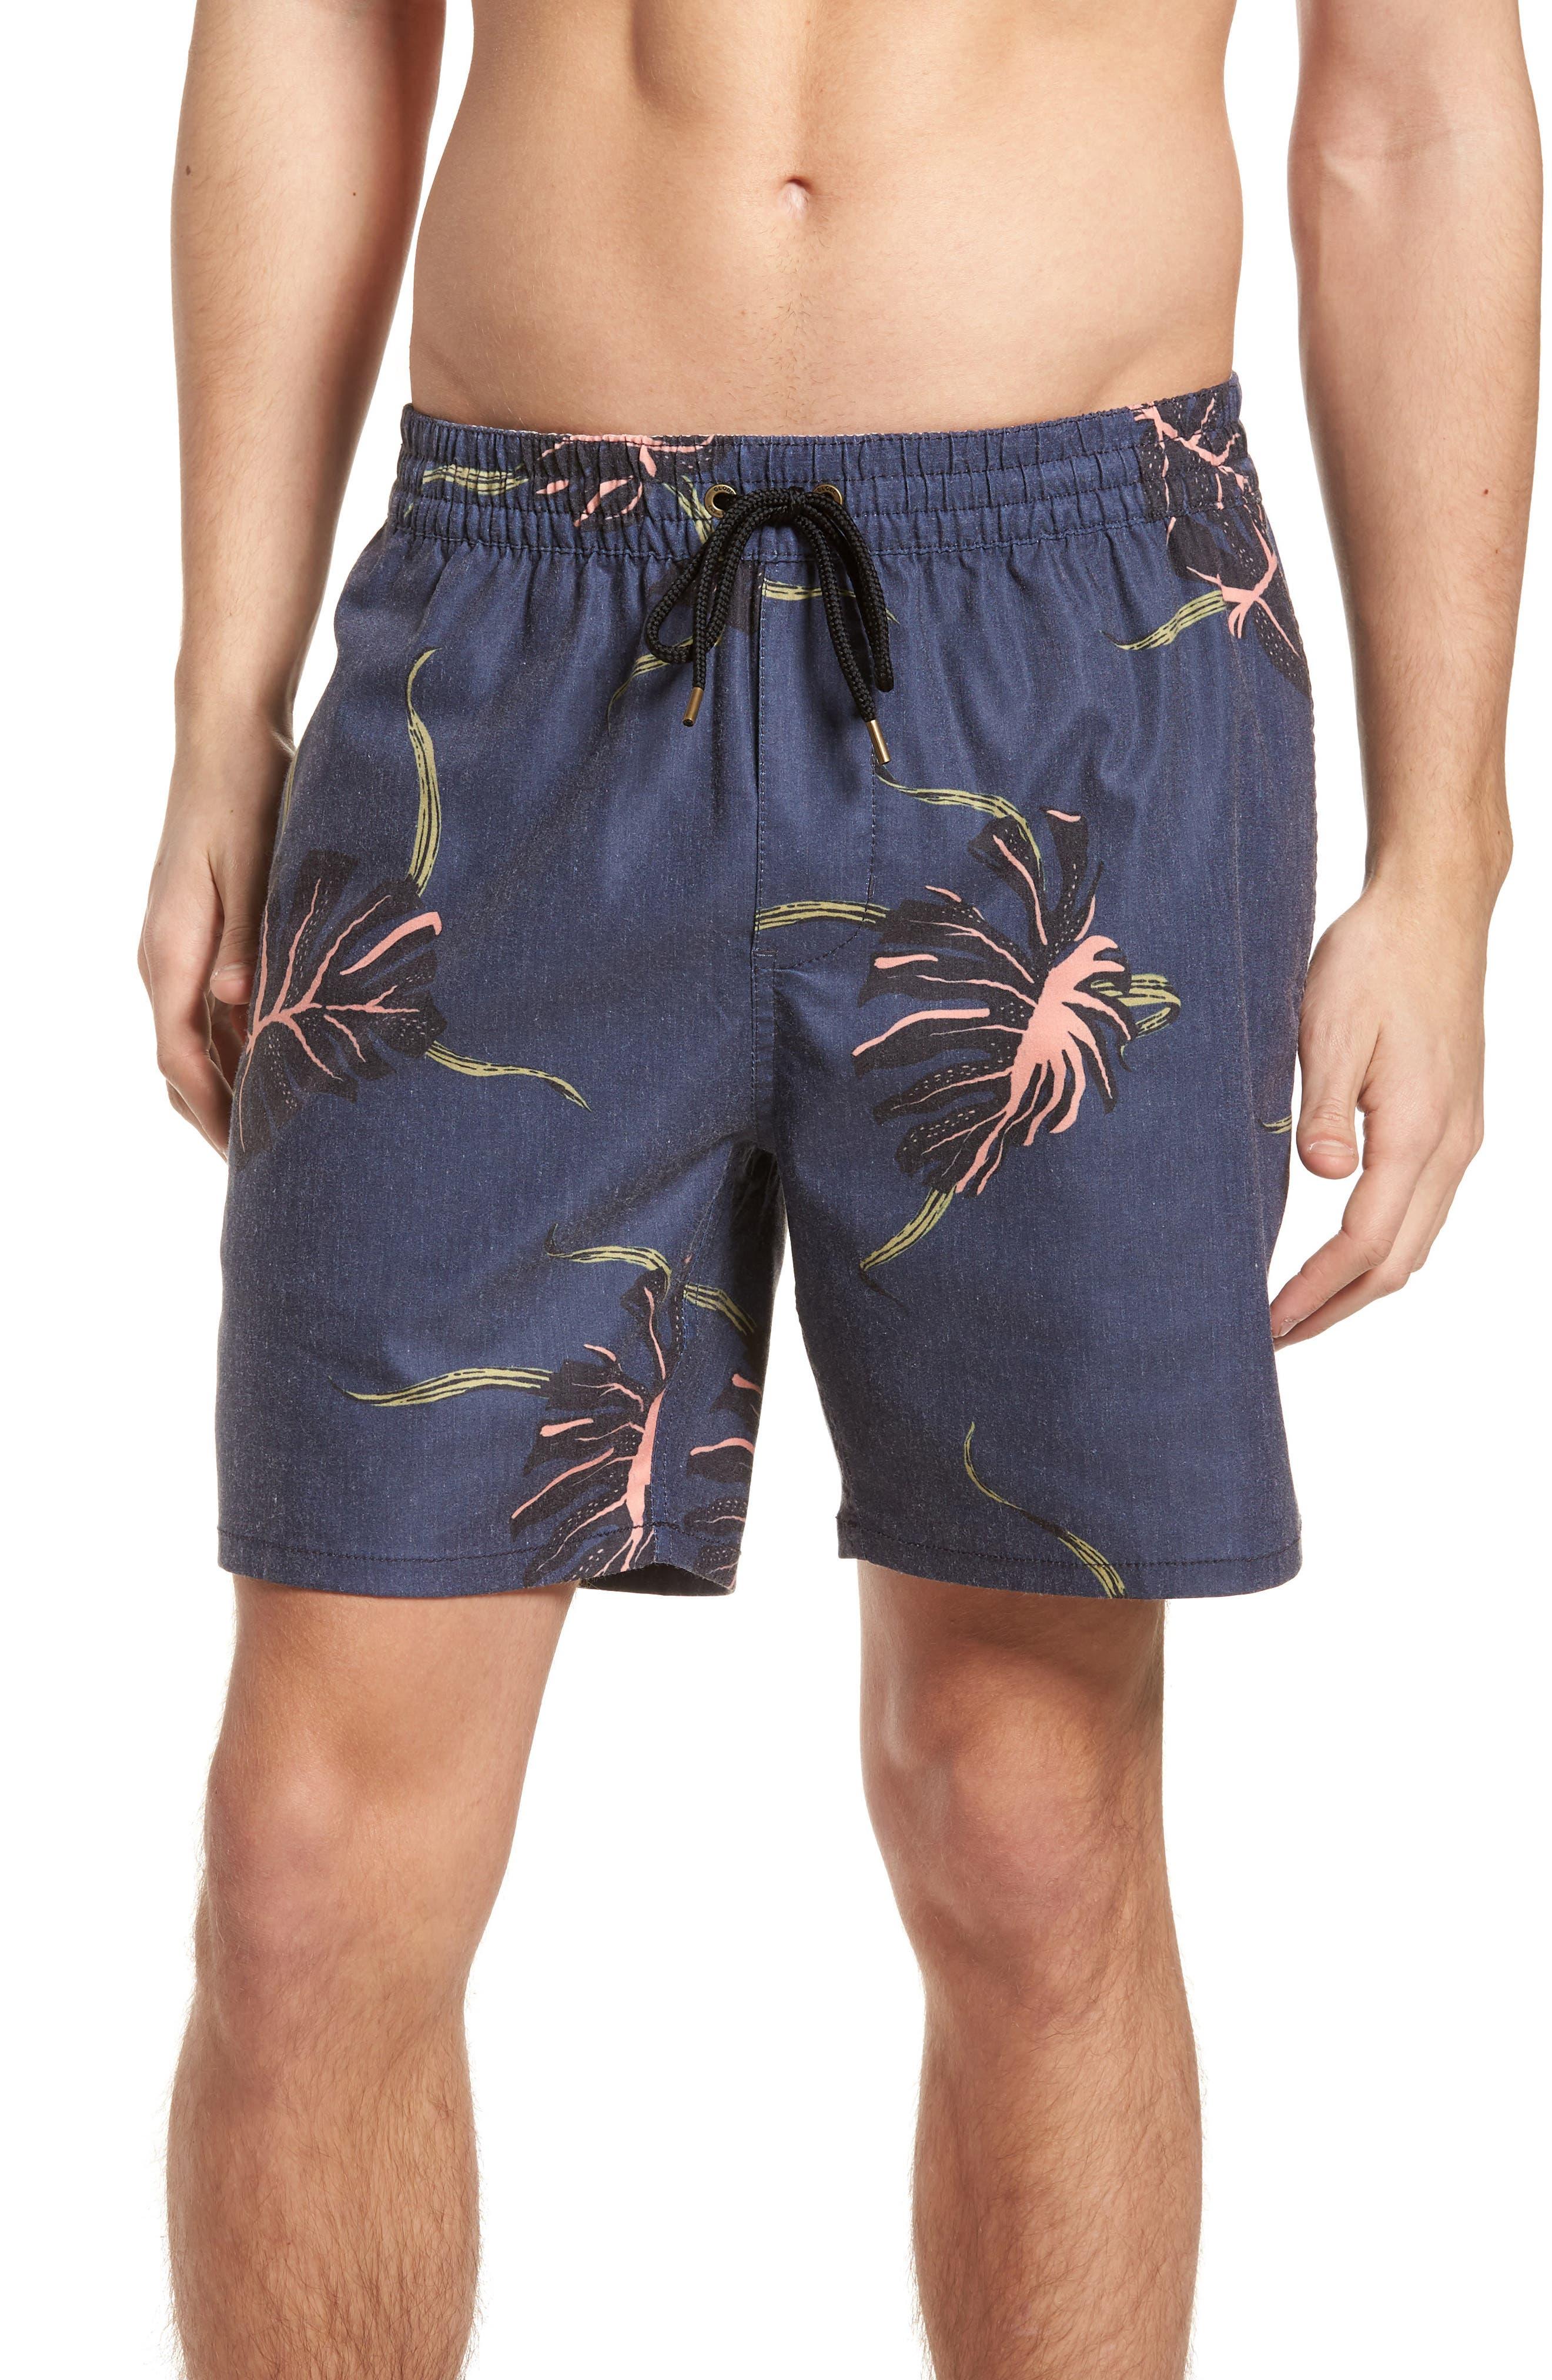 Pointer Pool Shorts,                         Main,                         color, Moonlight Blue